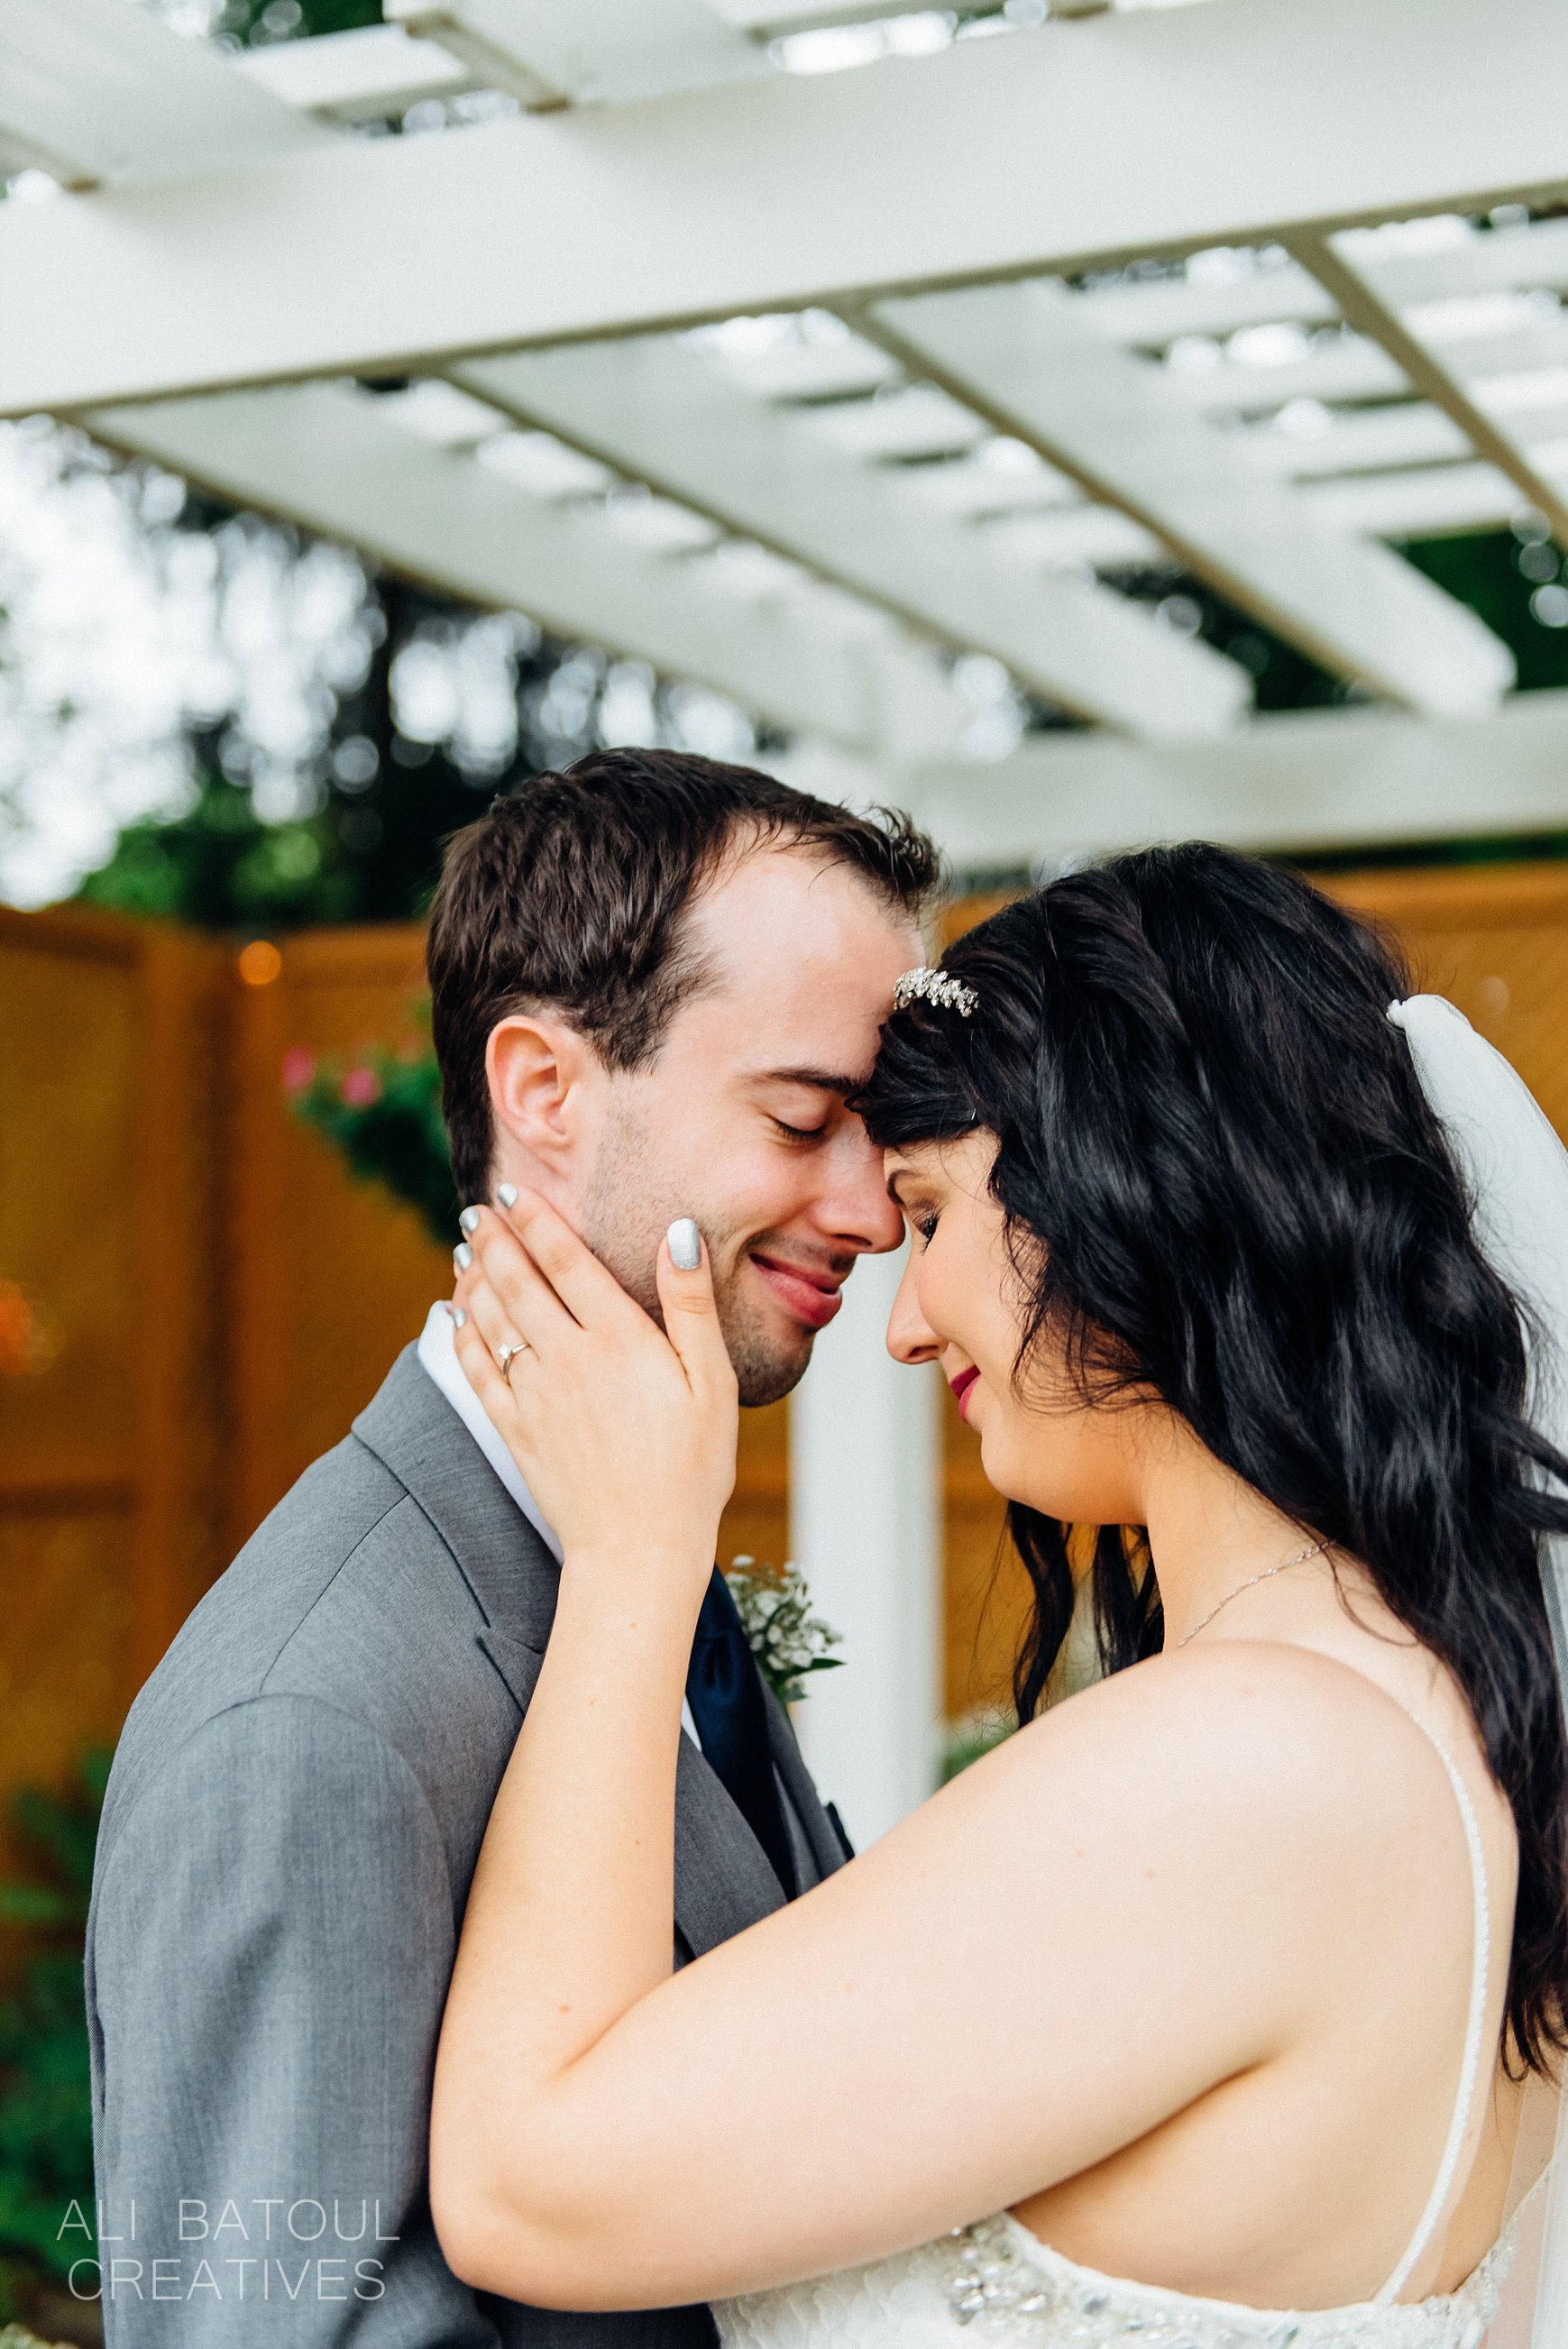 Jocelyn + Steve At The Schoolhouse Wedding - Ali and Batoul Fine Art Wedding Photography_0049.jpg